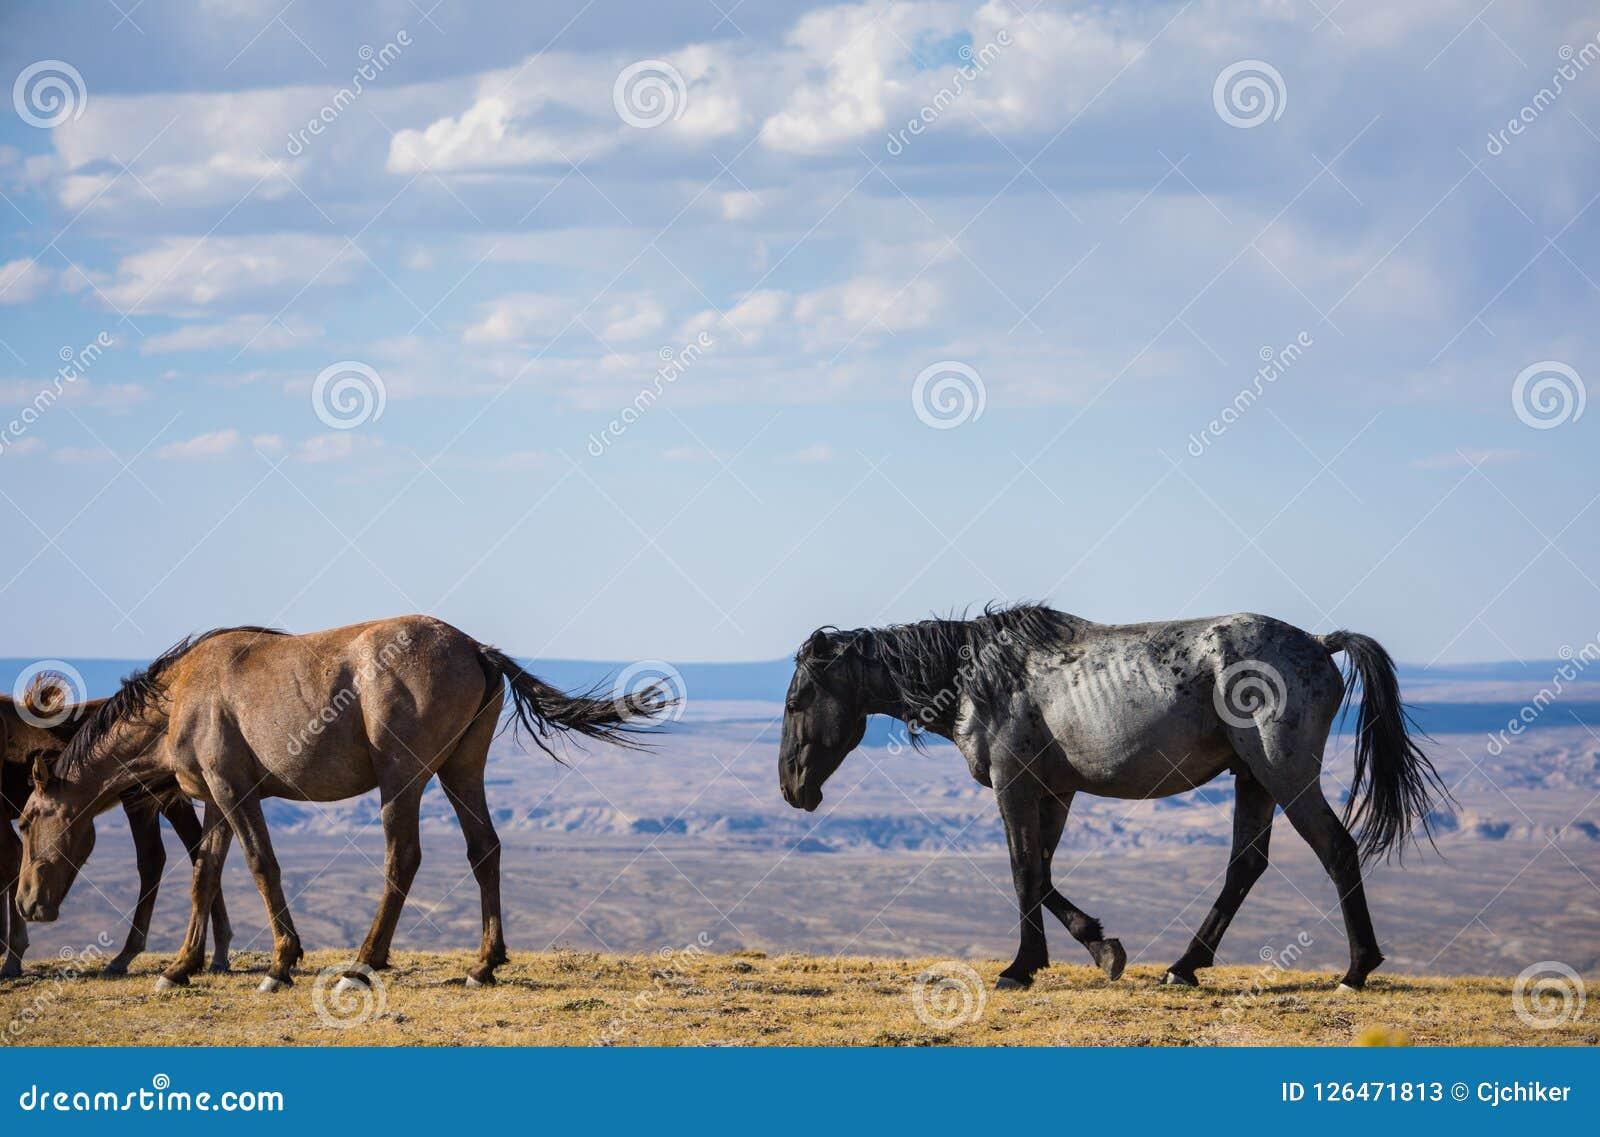 Wild Horses Brown And Black Stock Image Image Of Black Desert 126471813